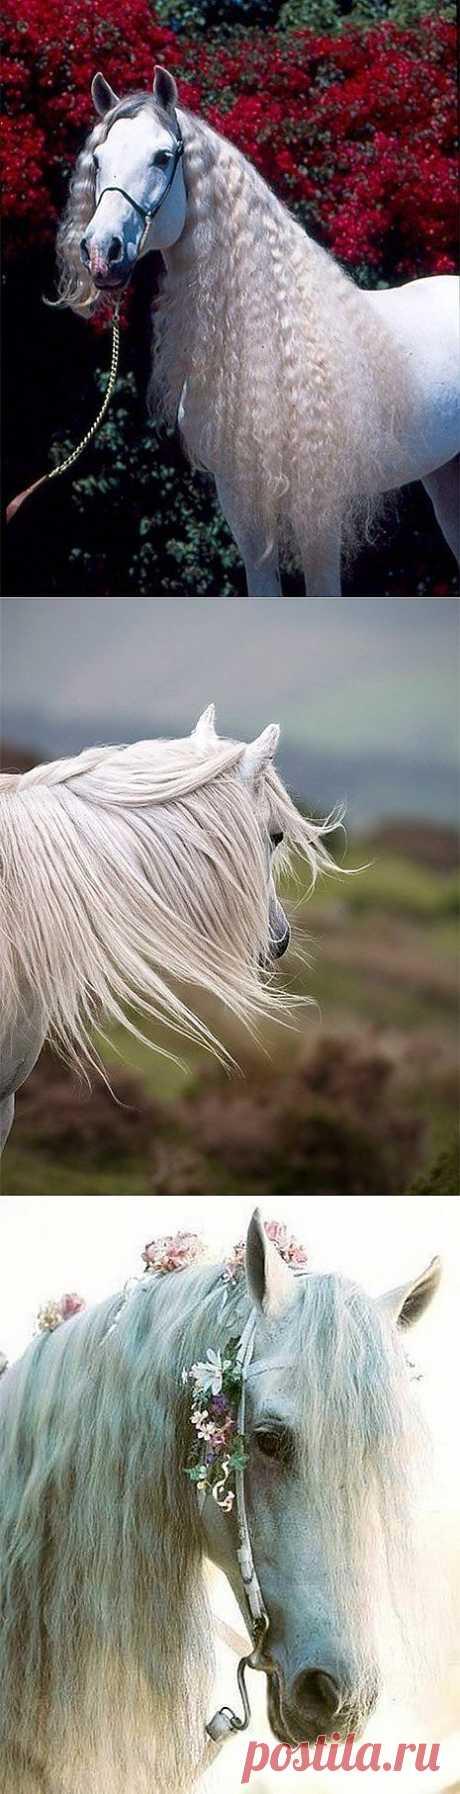 Лошади прямиком из сказки